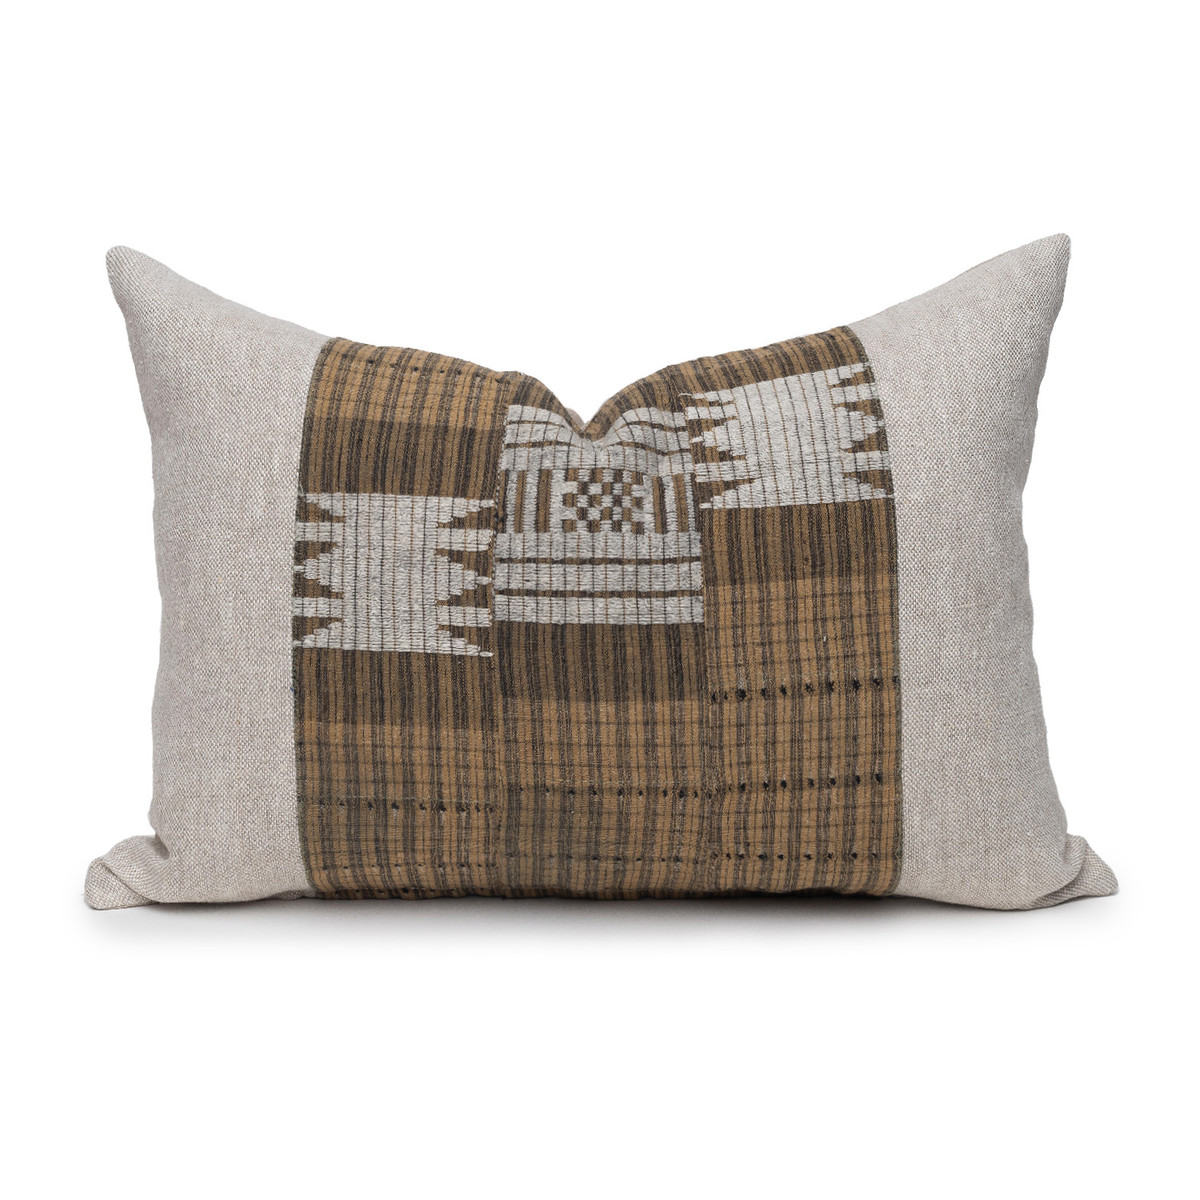 Autumn Natural Linen Aso Oke Stripe Luxe Vintage Lumbar Pillow - Front View